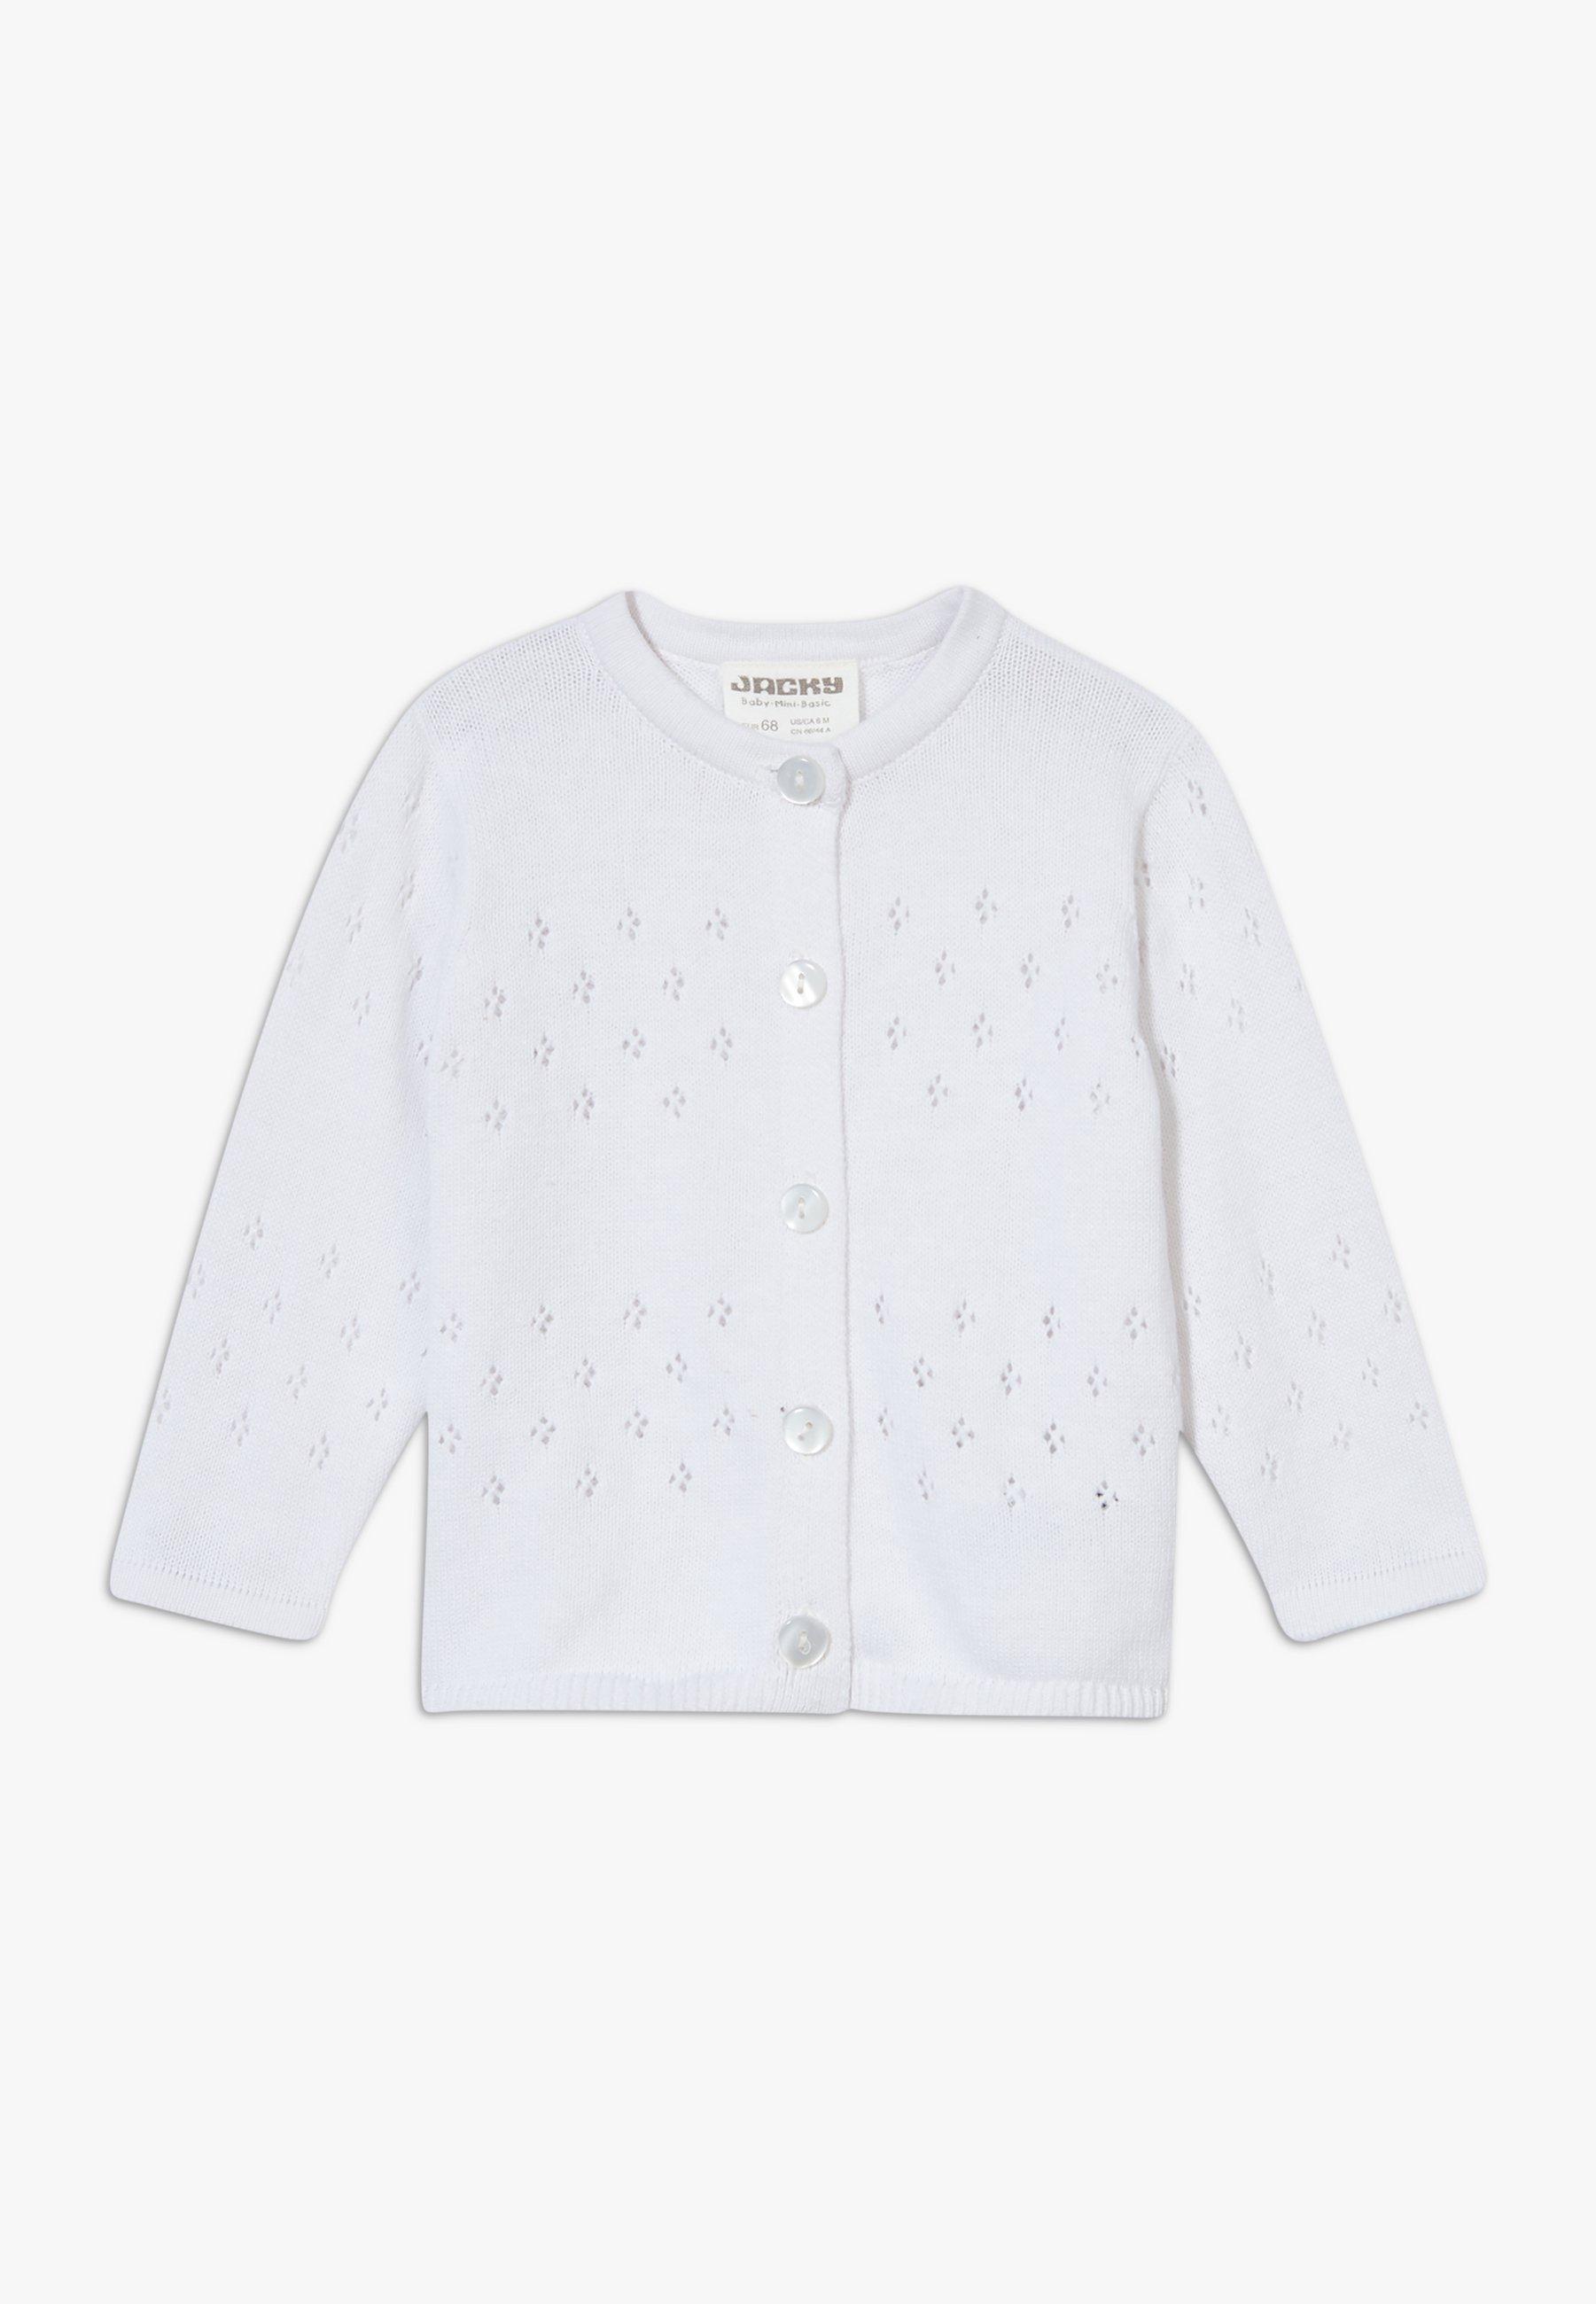 Große Förderung Jacky Baby ENCHANTED - Strickjacke - weiß | Damenbekleidung 2020